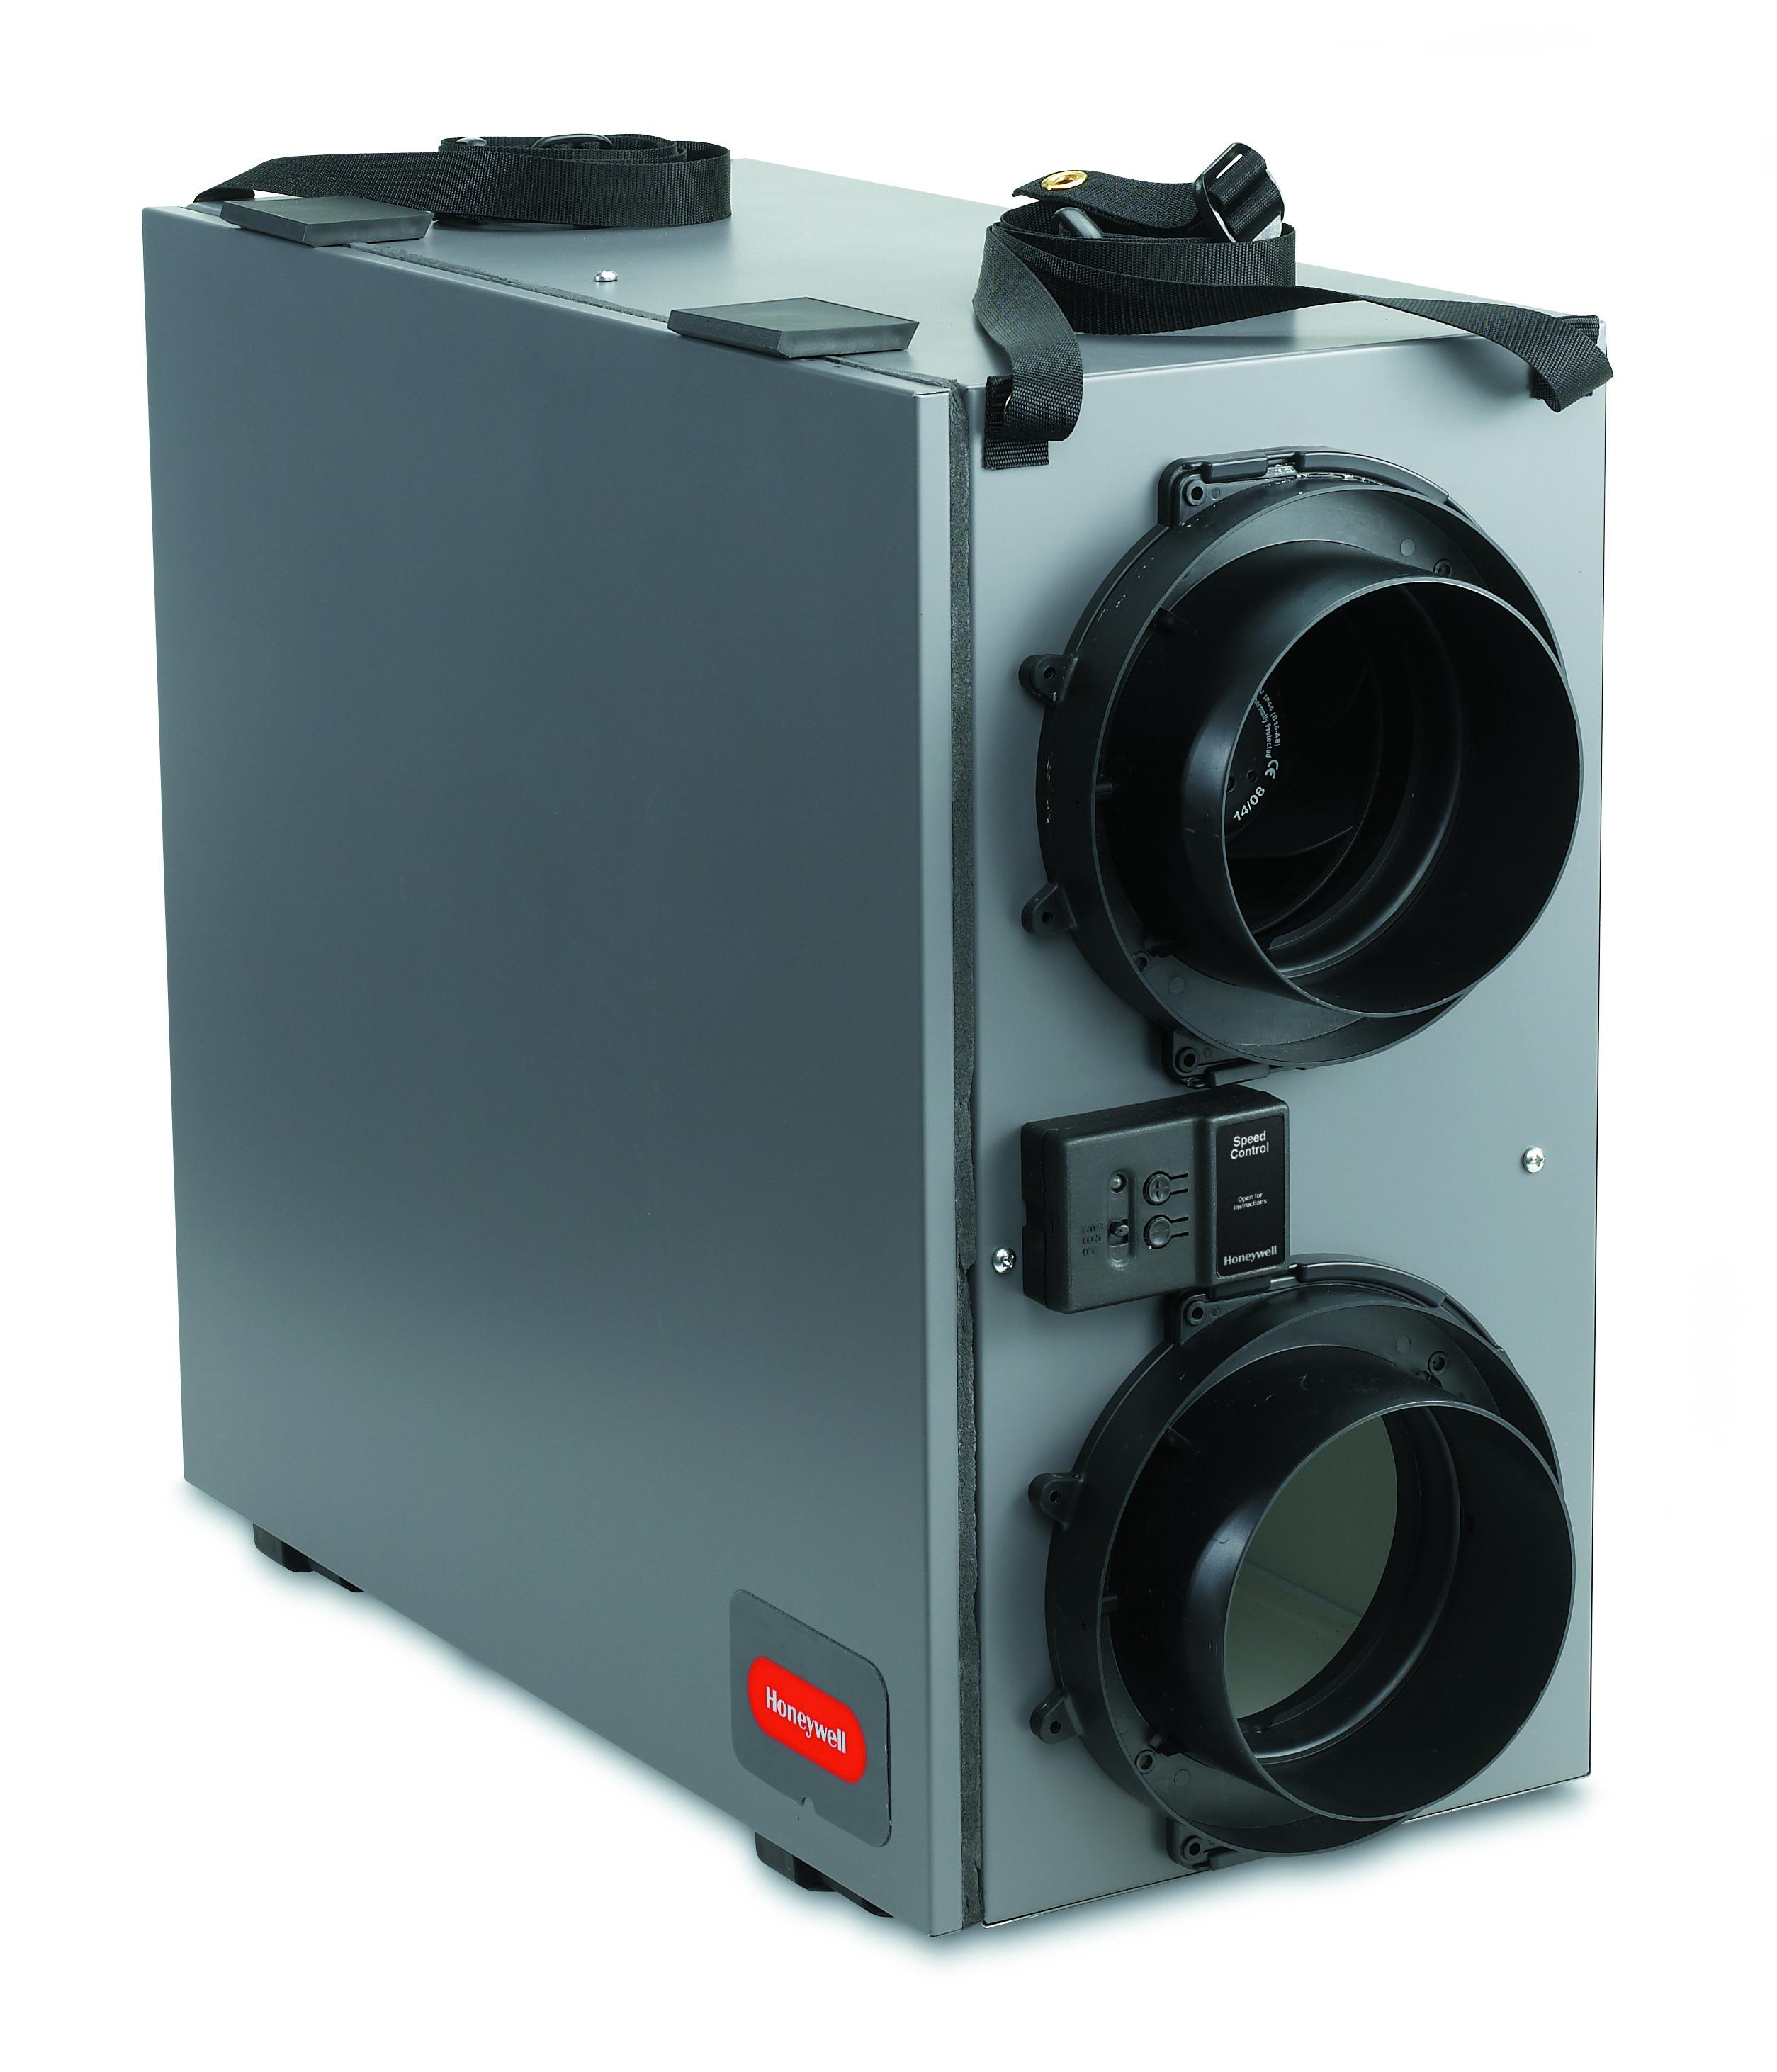 Honeywell Whole House Ventilation System : Honeywell truefresh series model vnt h hrv